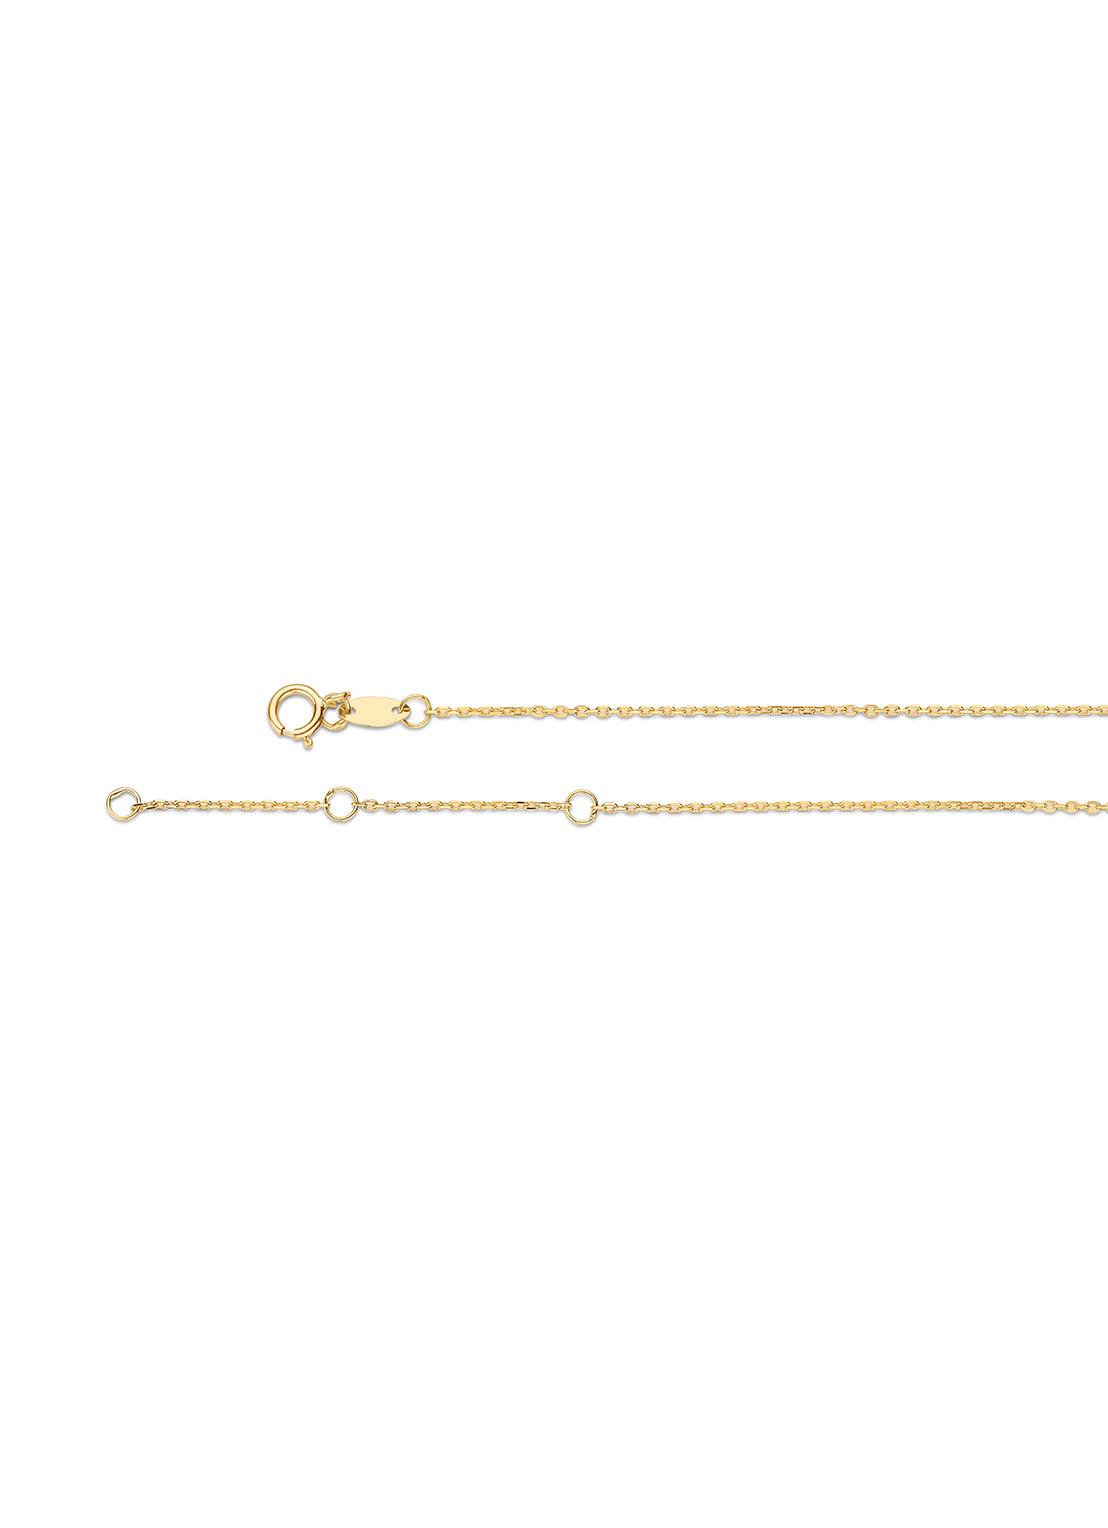 14 karaat geelgouden dames ketting - Jackie - Long Ovals Necklace-3